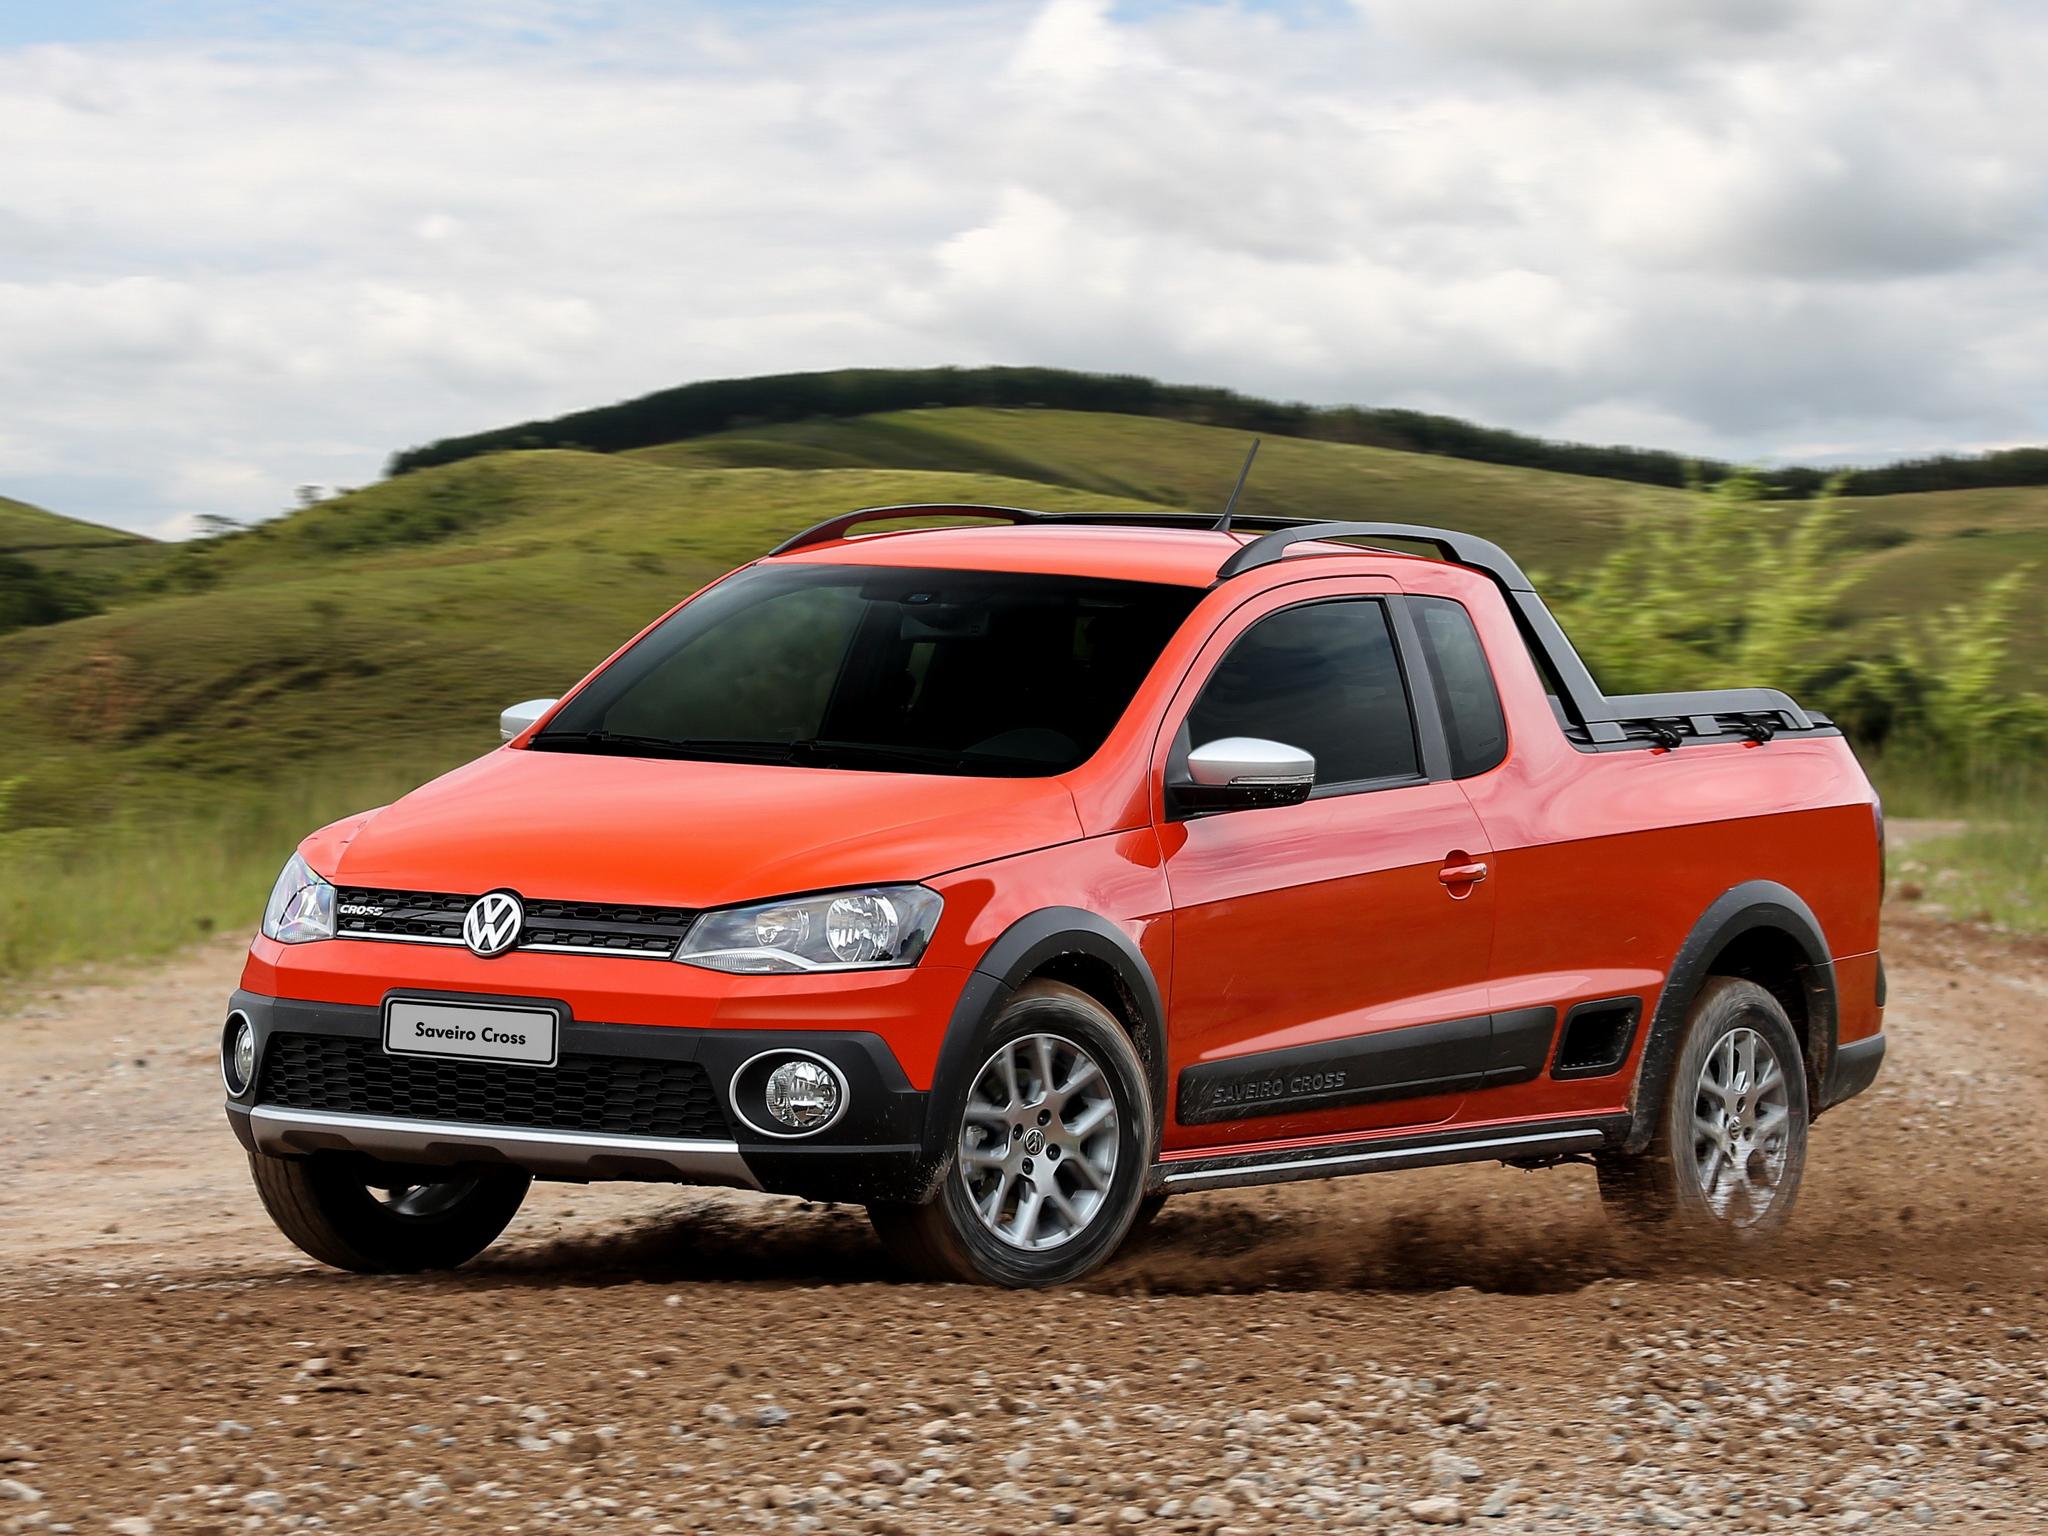 2014 Volkswagen Saveiro Cross Is A Funky Brazilian Pickup